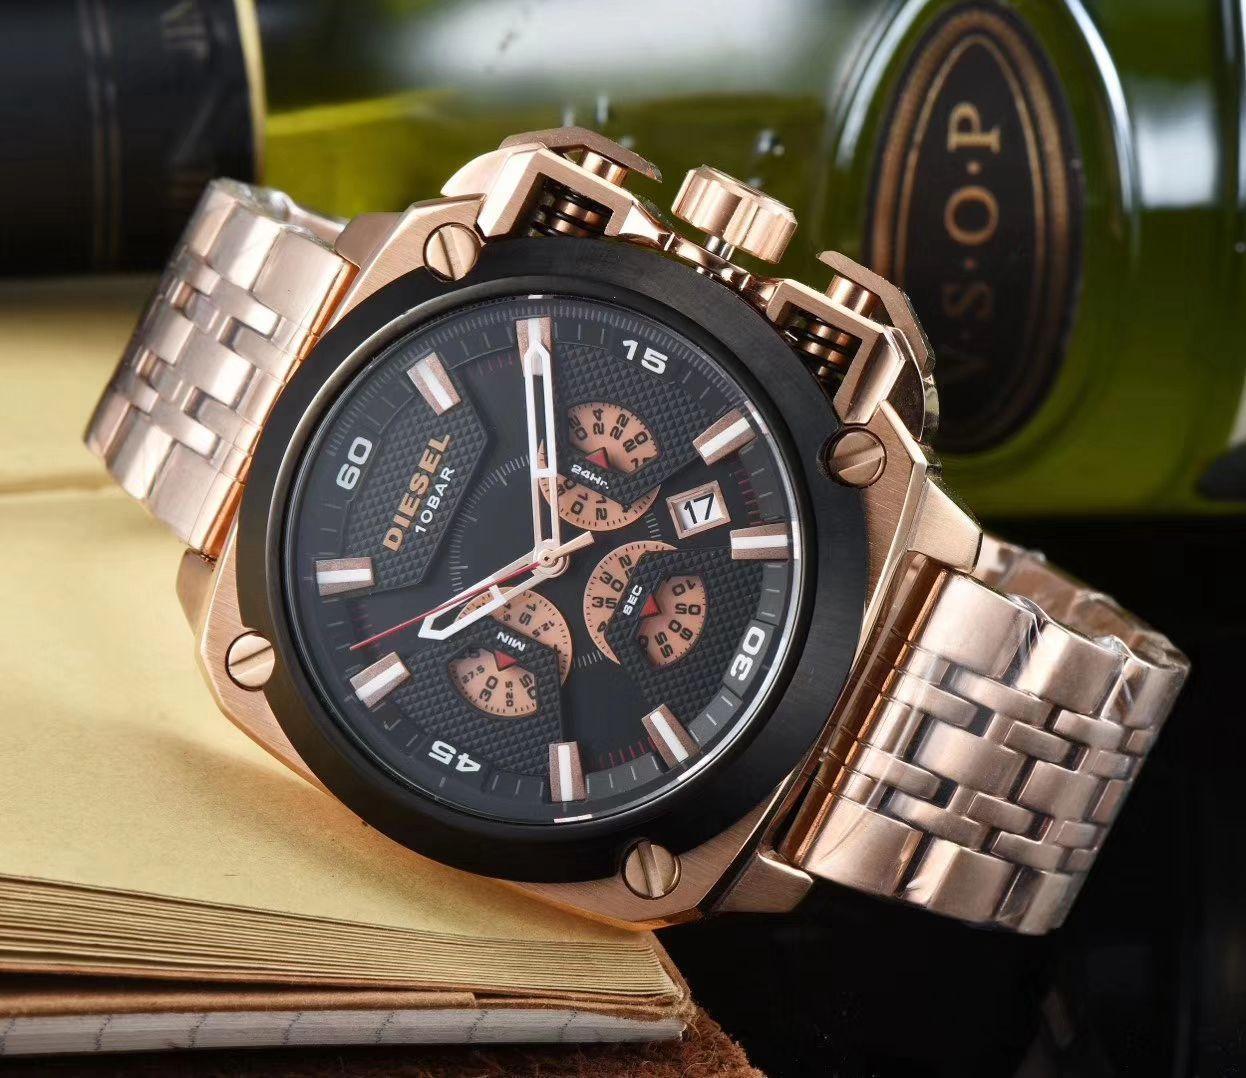 diesels watch Multi Time Zone reloj Military Clock Leather Strap 53MM Big dial DZ Stainless steel Watch Men's Sport Quartz